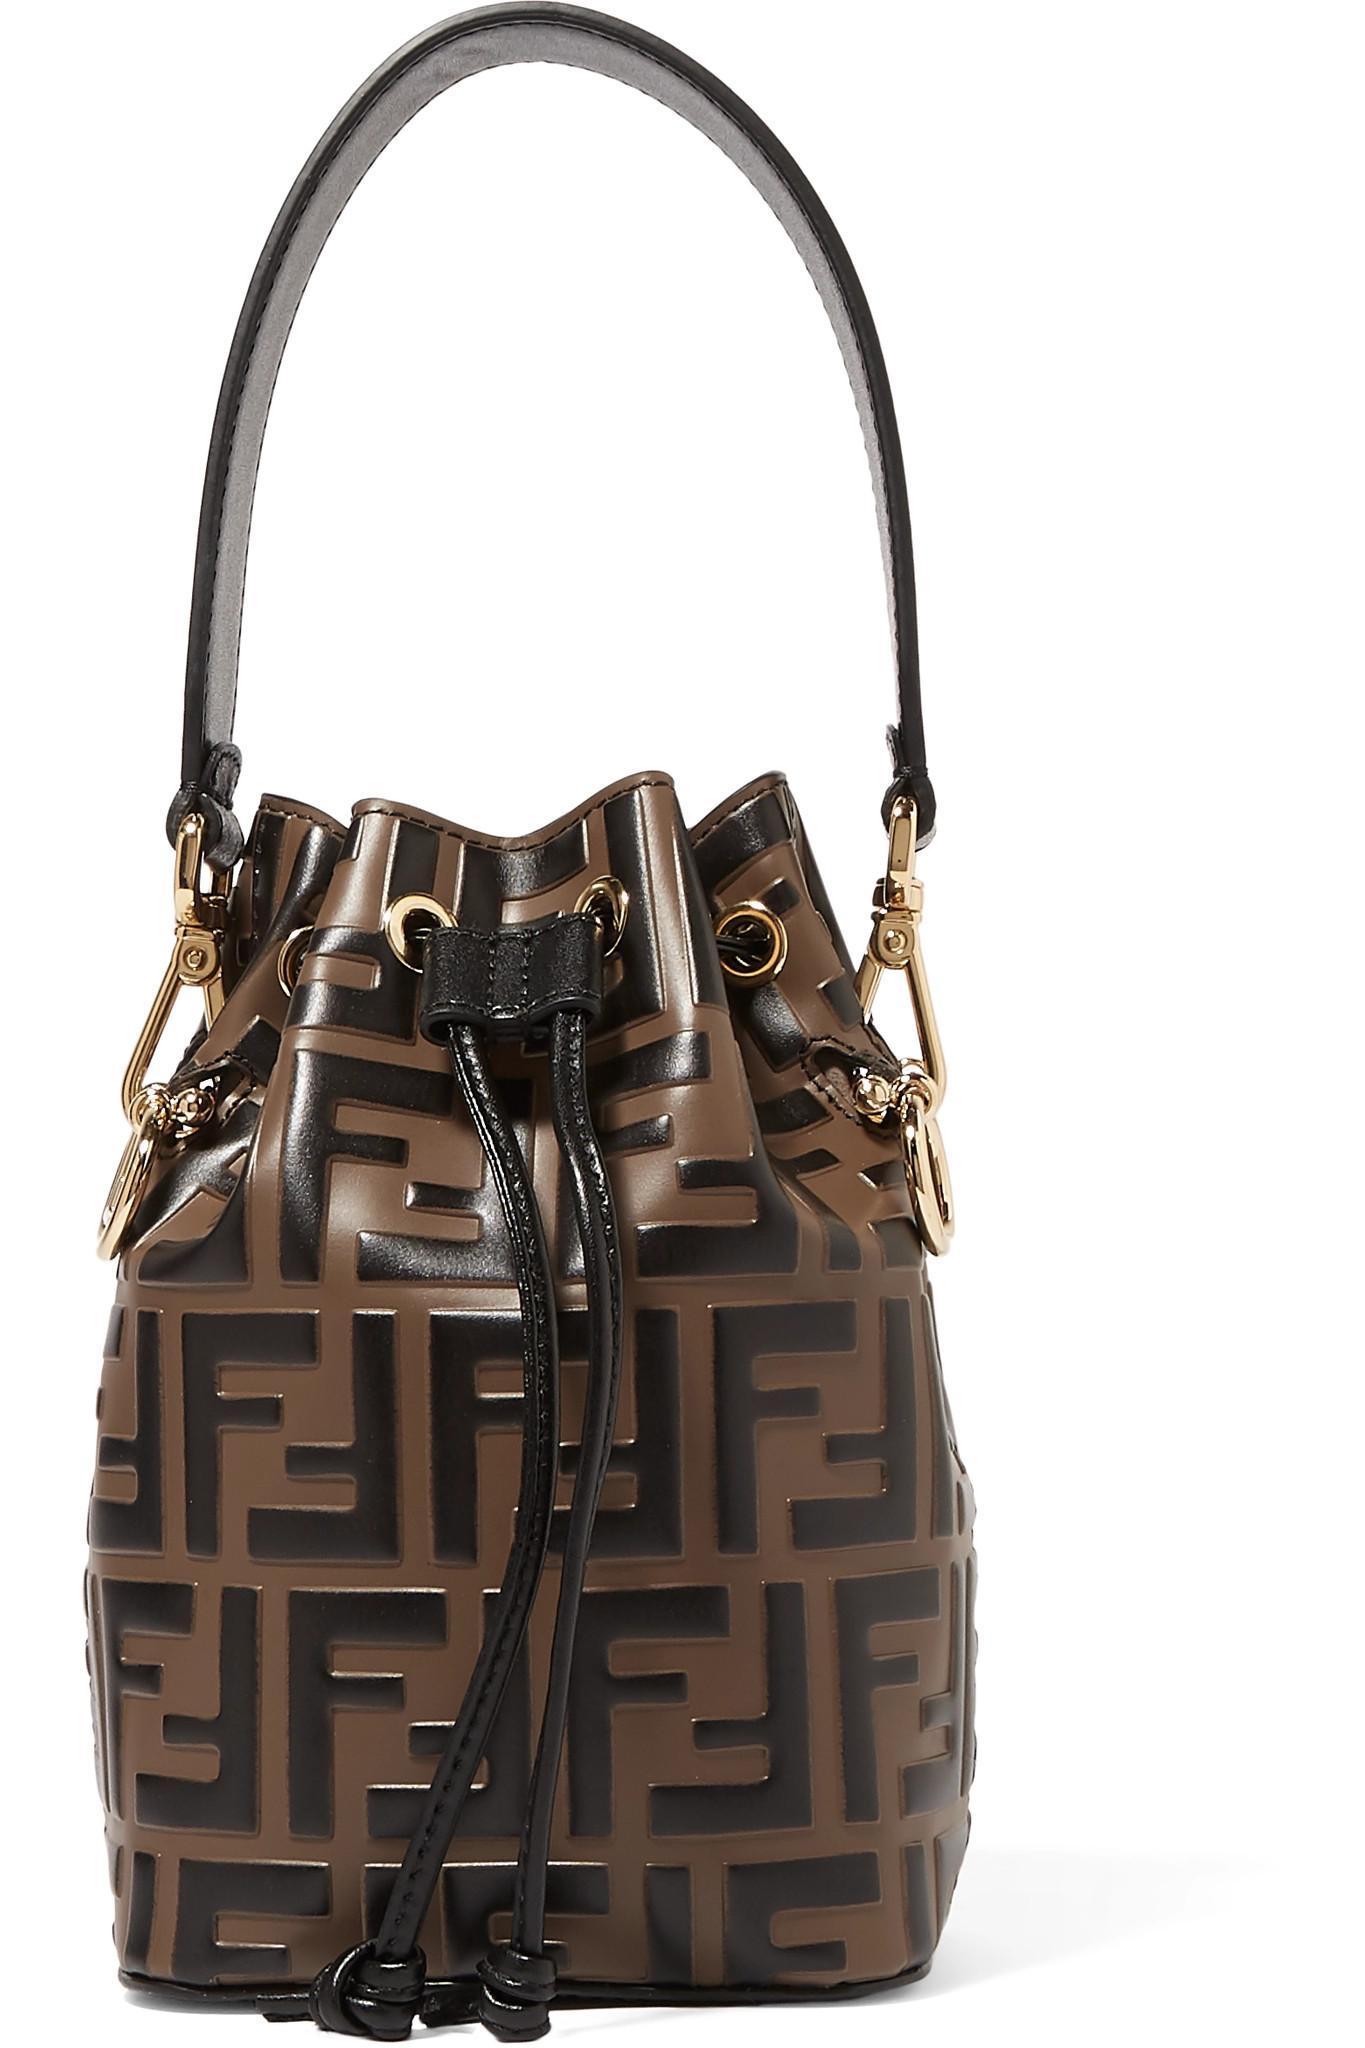 Fendi Mon Trésor Mini Embossed Leather Bucket Bag in Brown - Lyst fe2efb8335ab4